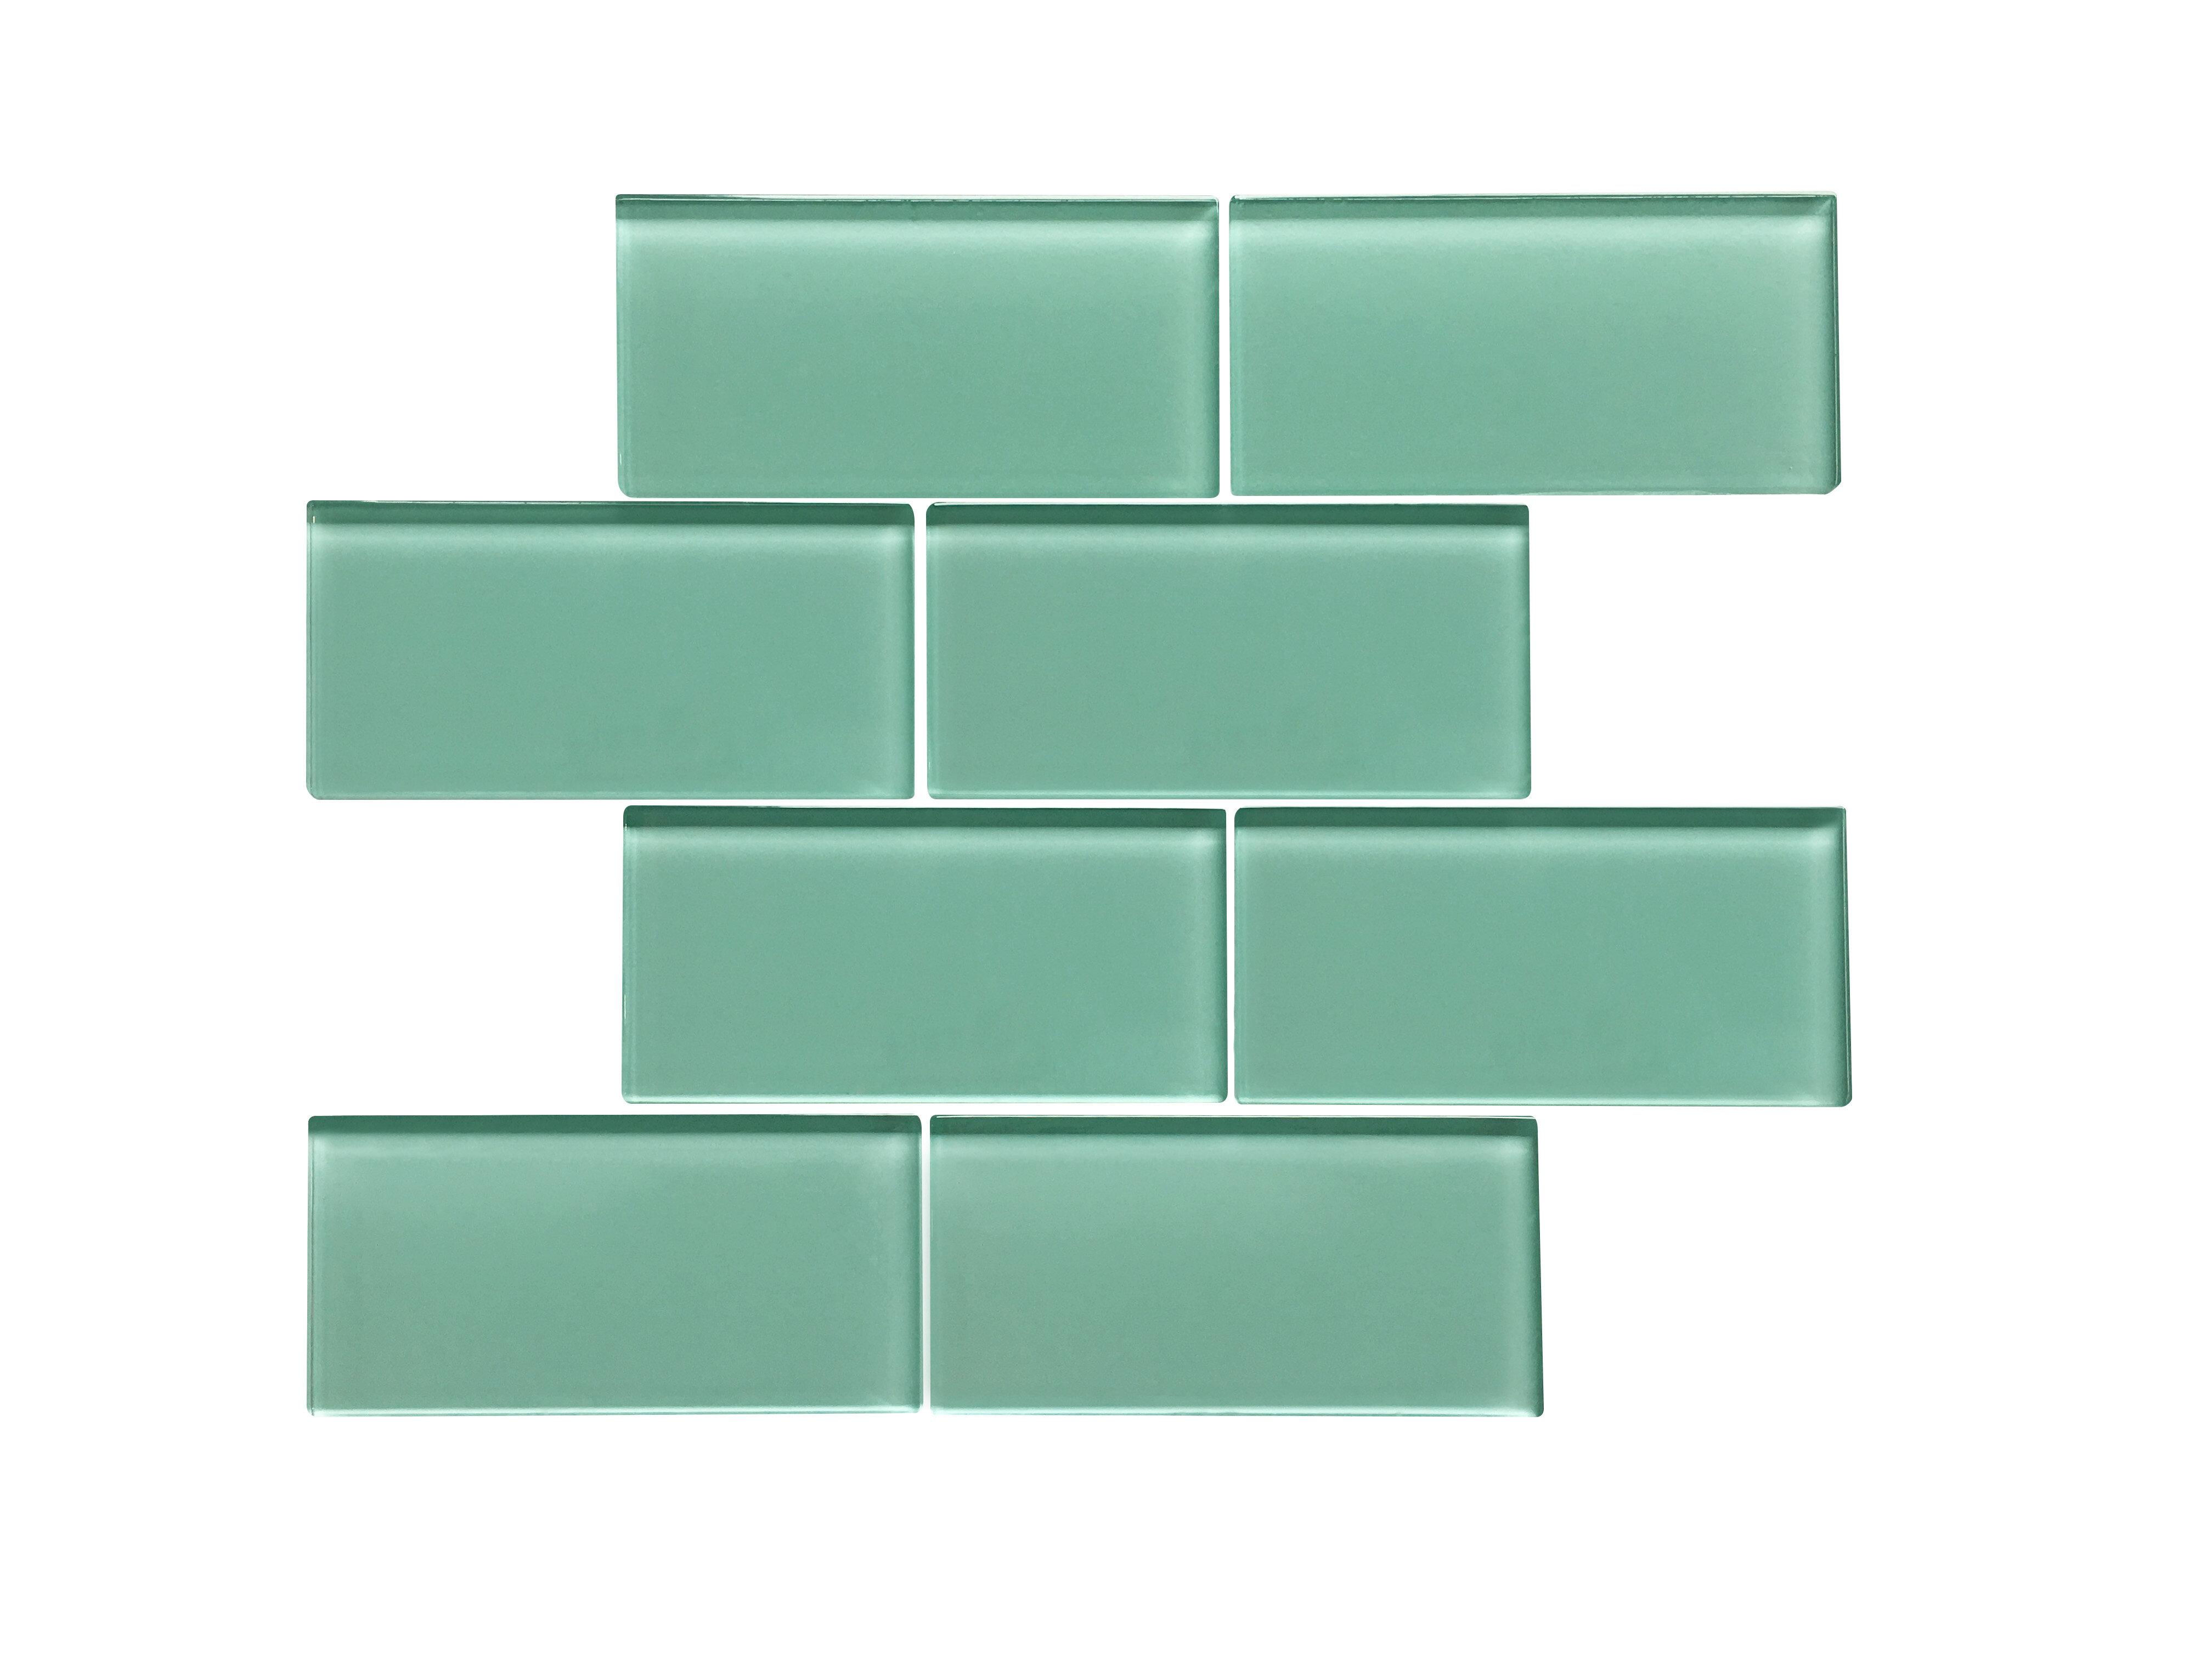 Ws Tiles Premium Series 3 X 6 Gl Subway Tile In Glossy Light Teal Reviews Wayfair